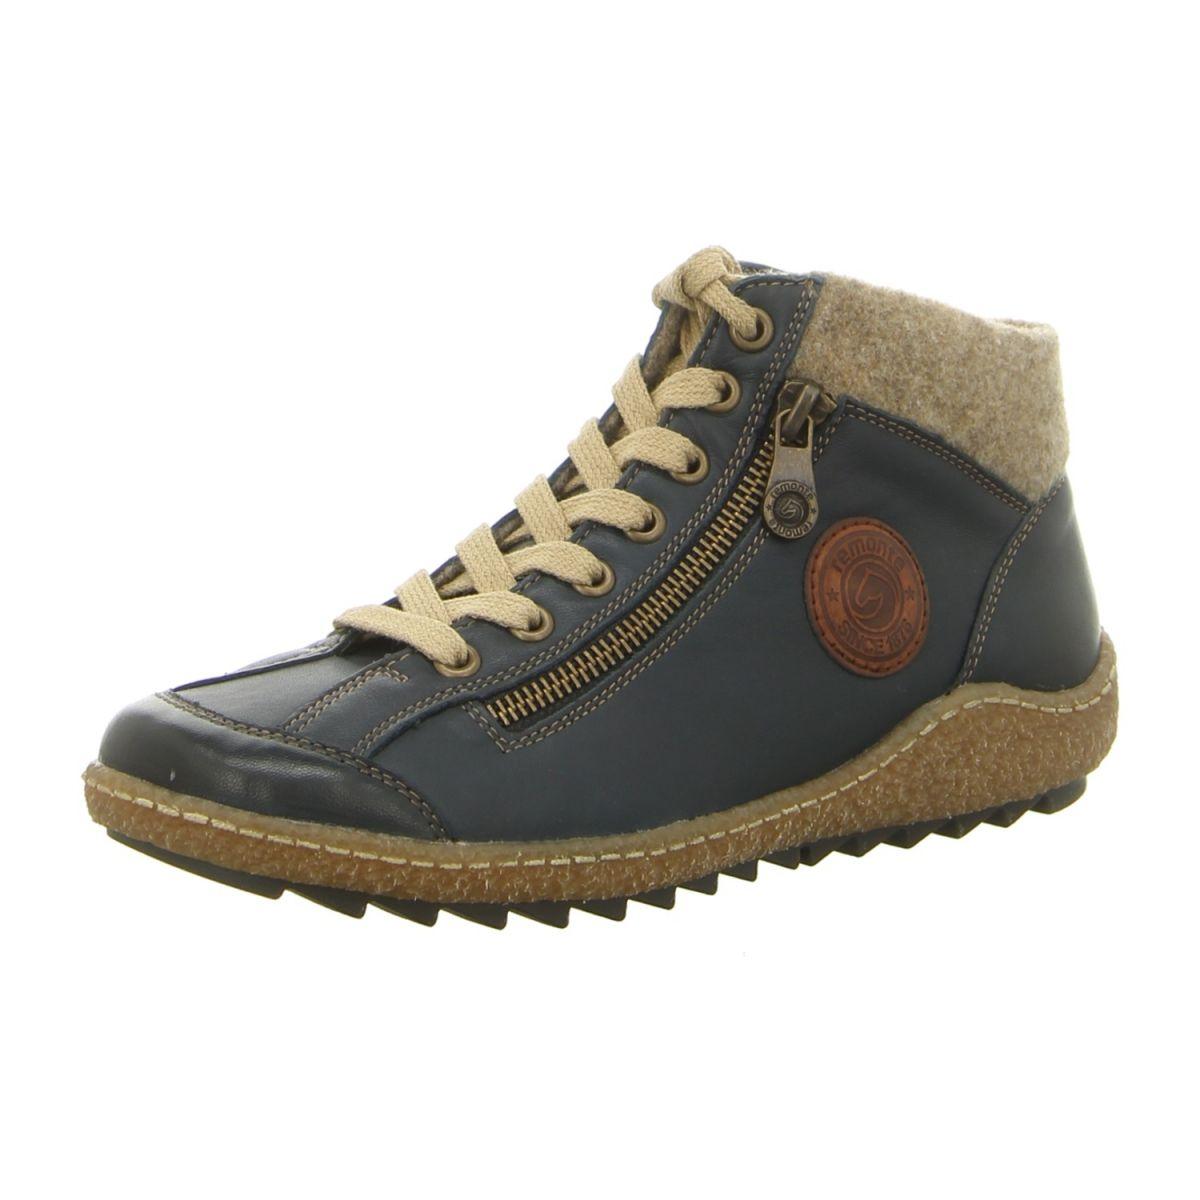 Remonte Schuhe Stiefelette R1474-35 rot kombi (rot) NEU